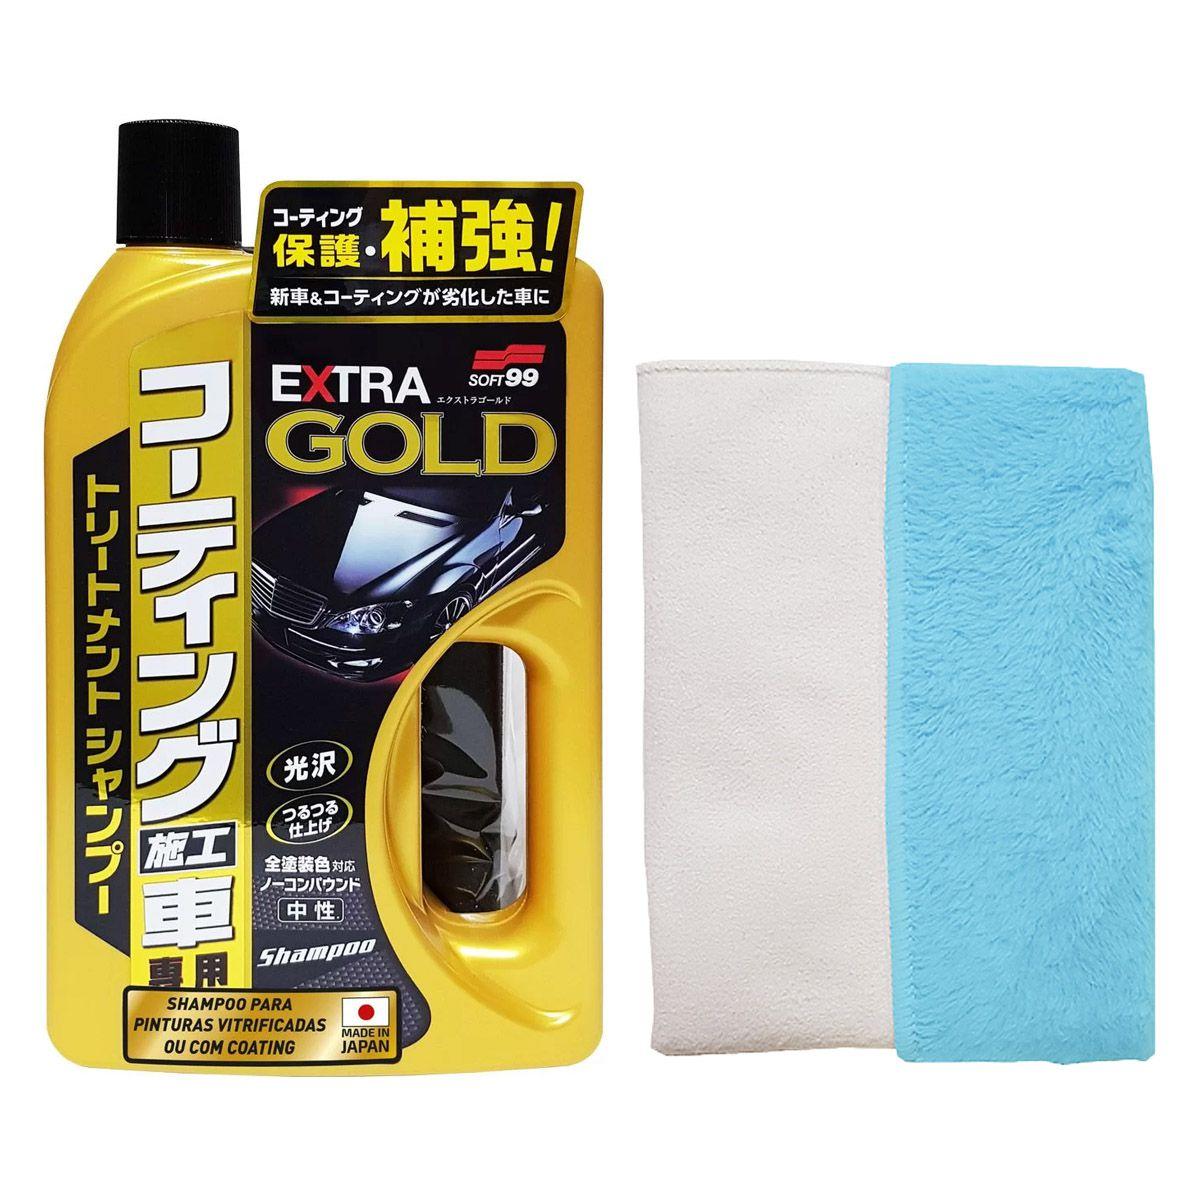 Kit Shampoo Extra Gold 750ml + Toalha Hibrida Sem Embalagem 30x40 Soft99